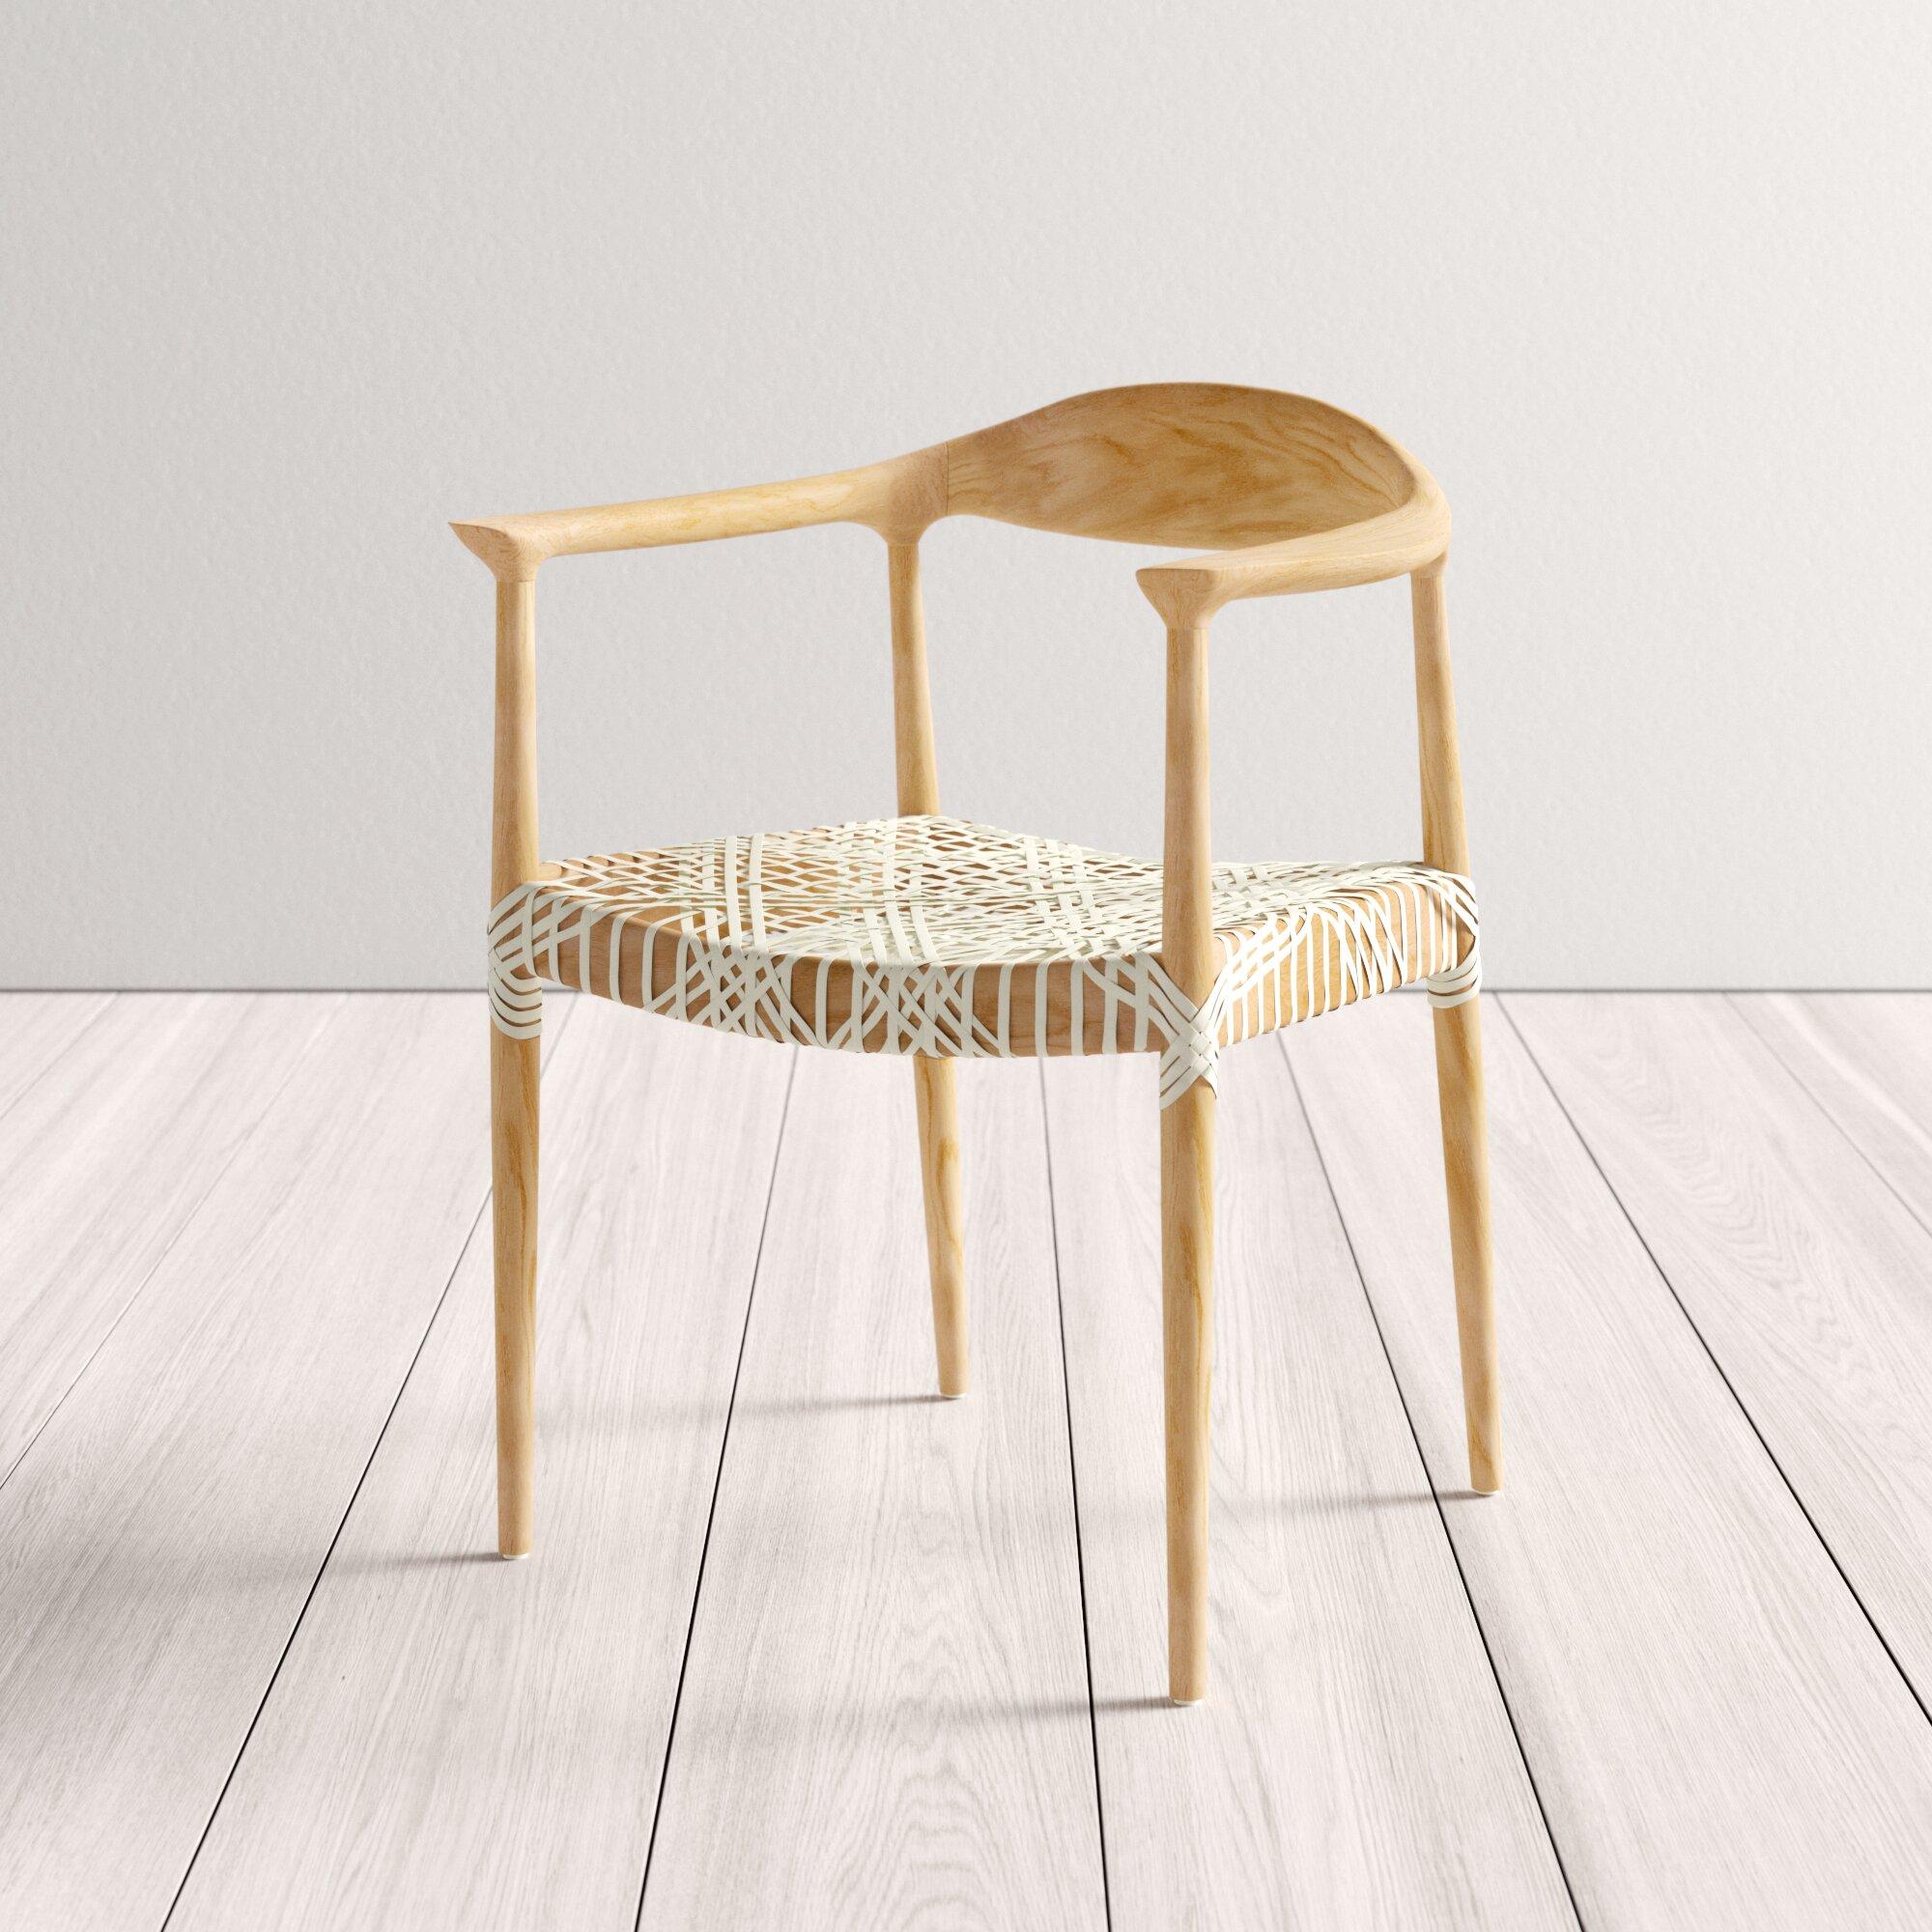 Sensational Mistana Amelia Solid Wood Dining Chair Cjindustries Chair Design For Home Cjindustriesco